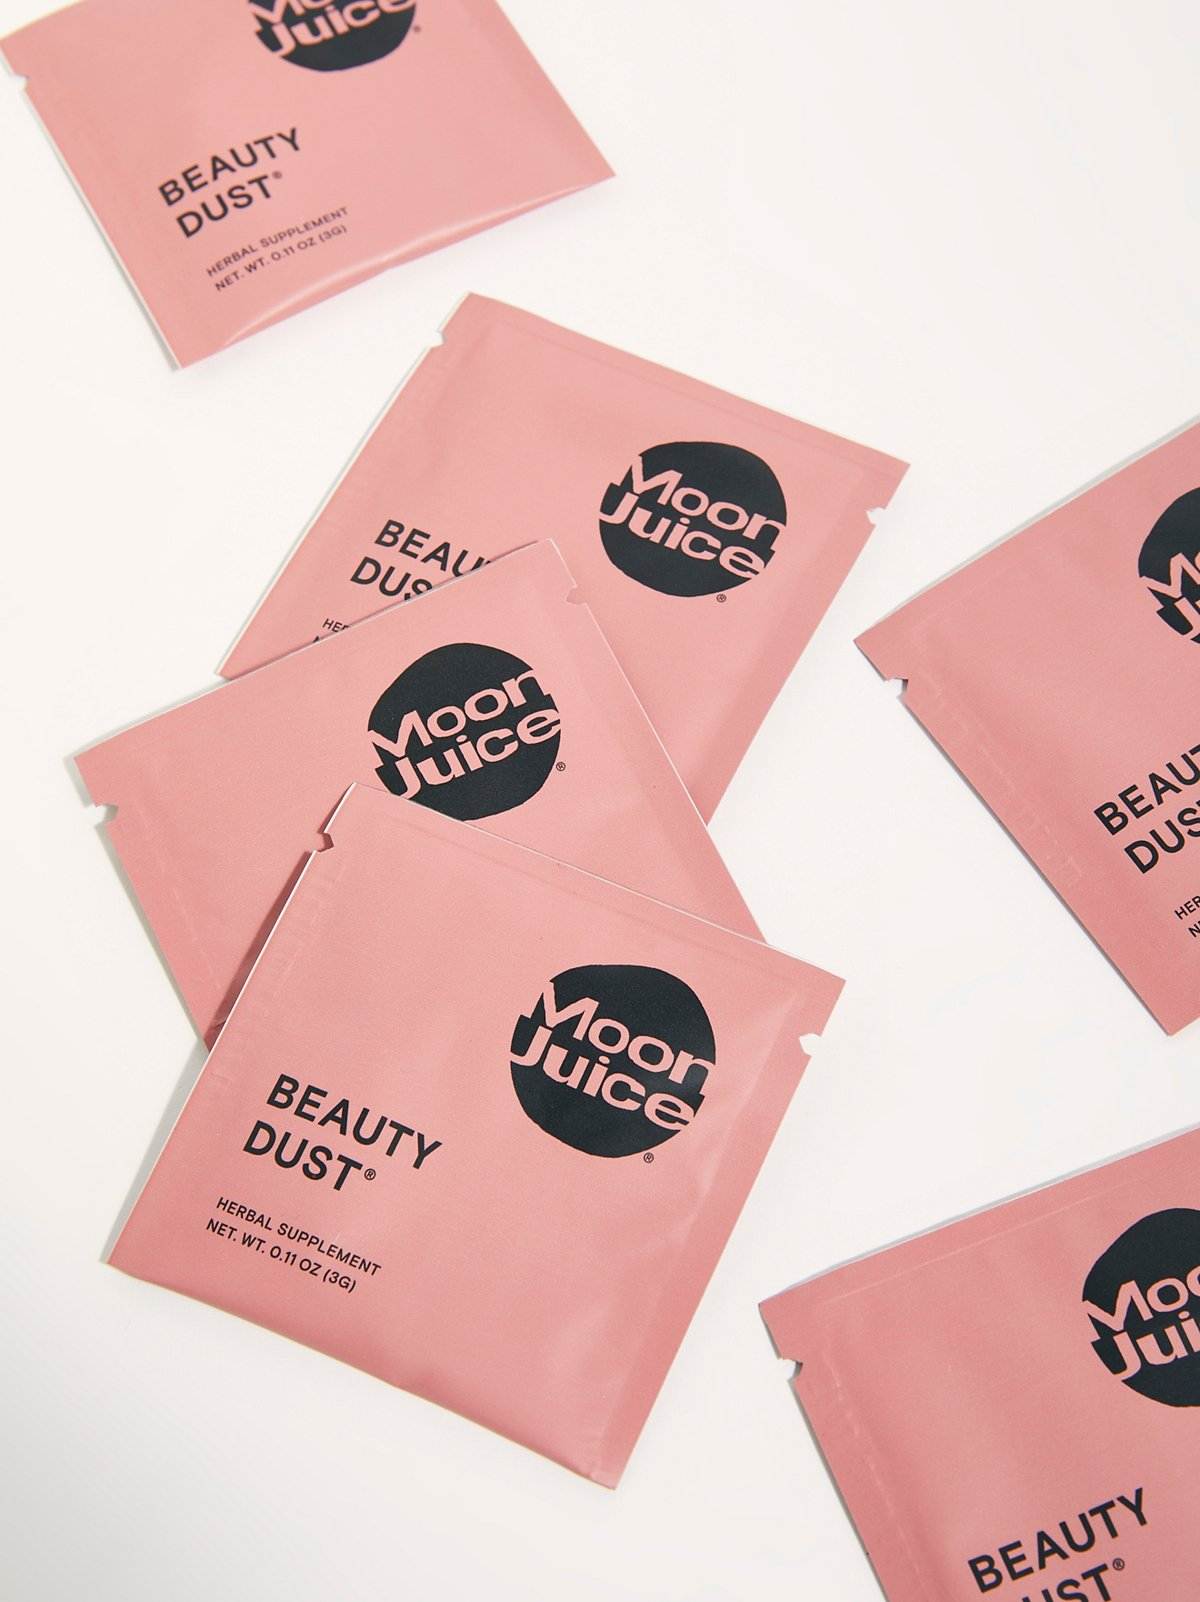 Moon Dust by Moon Juice Sachet Box